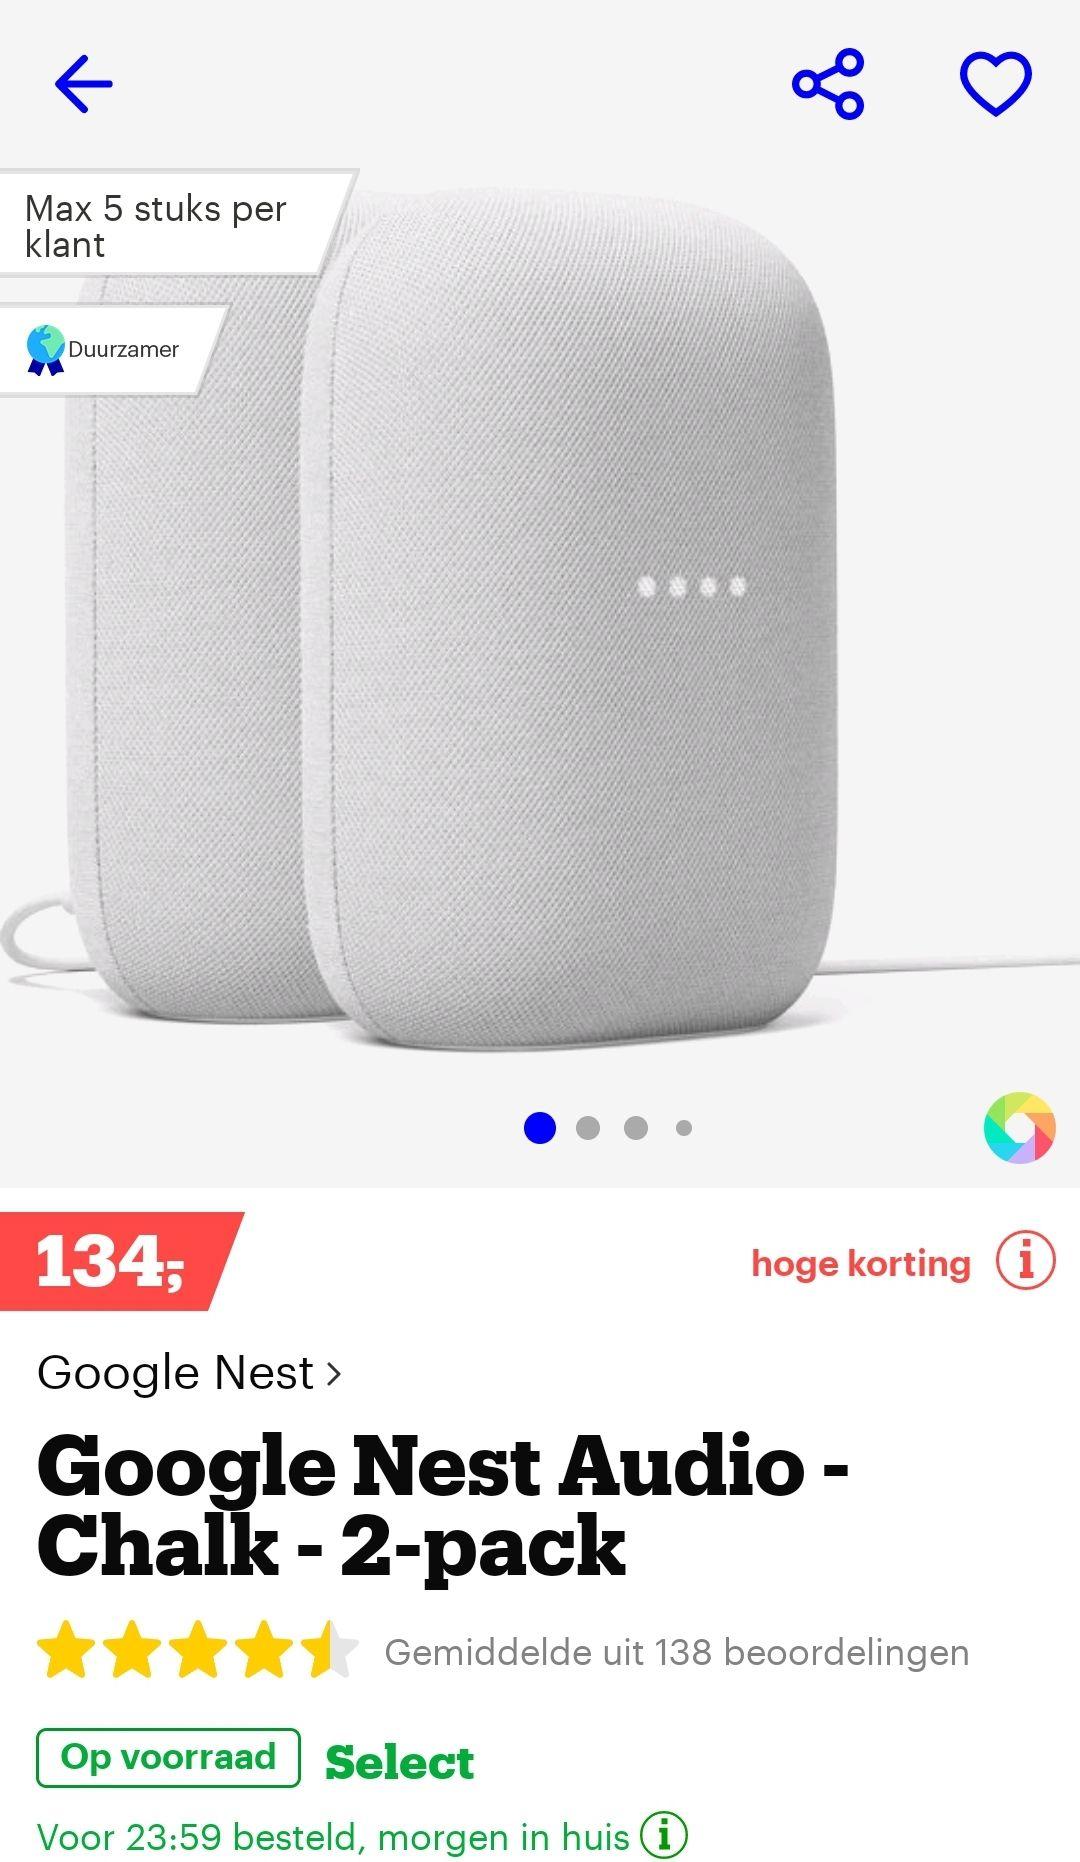 Google nest audio 2-pack krijt of houtskool